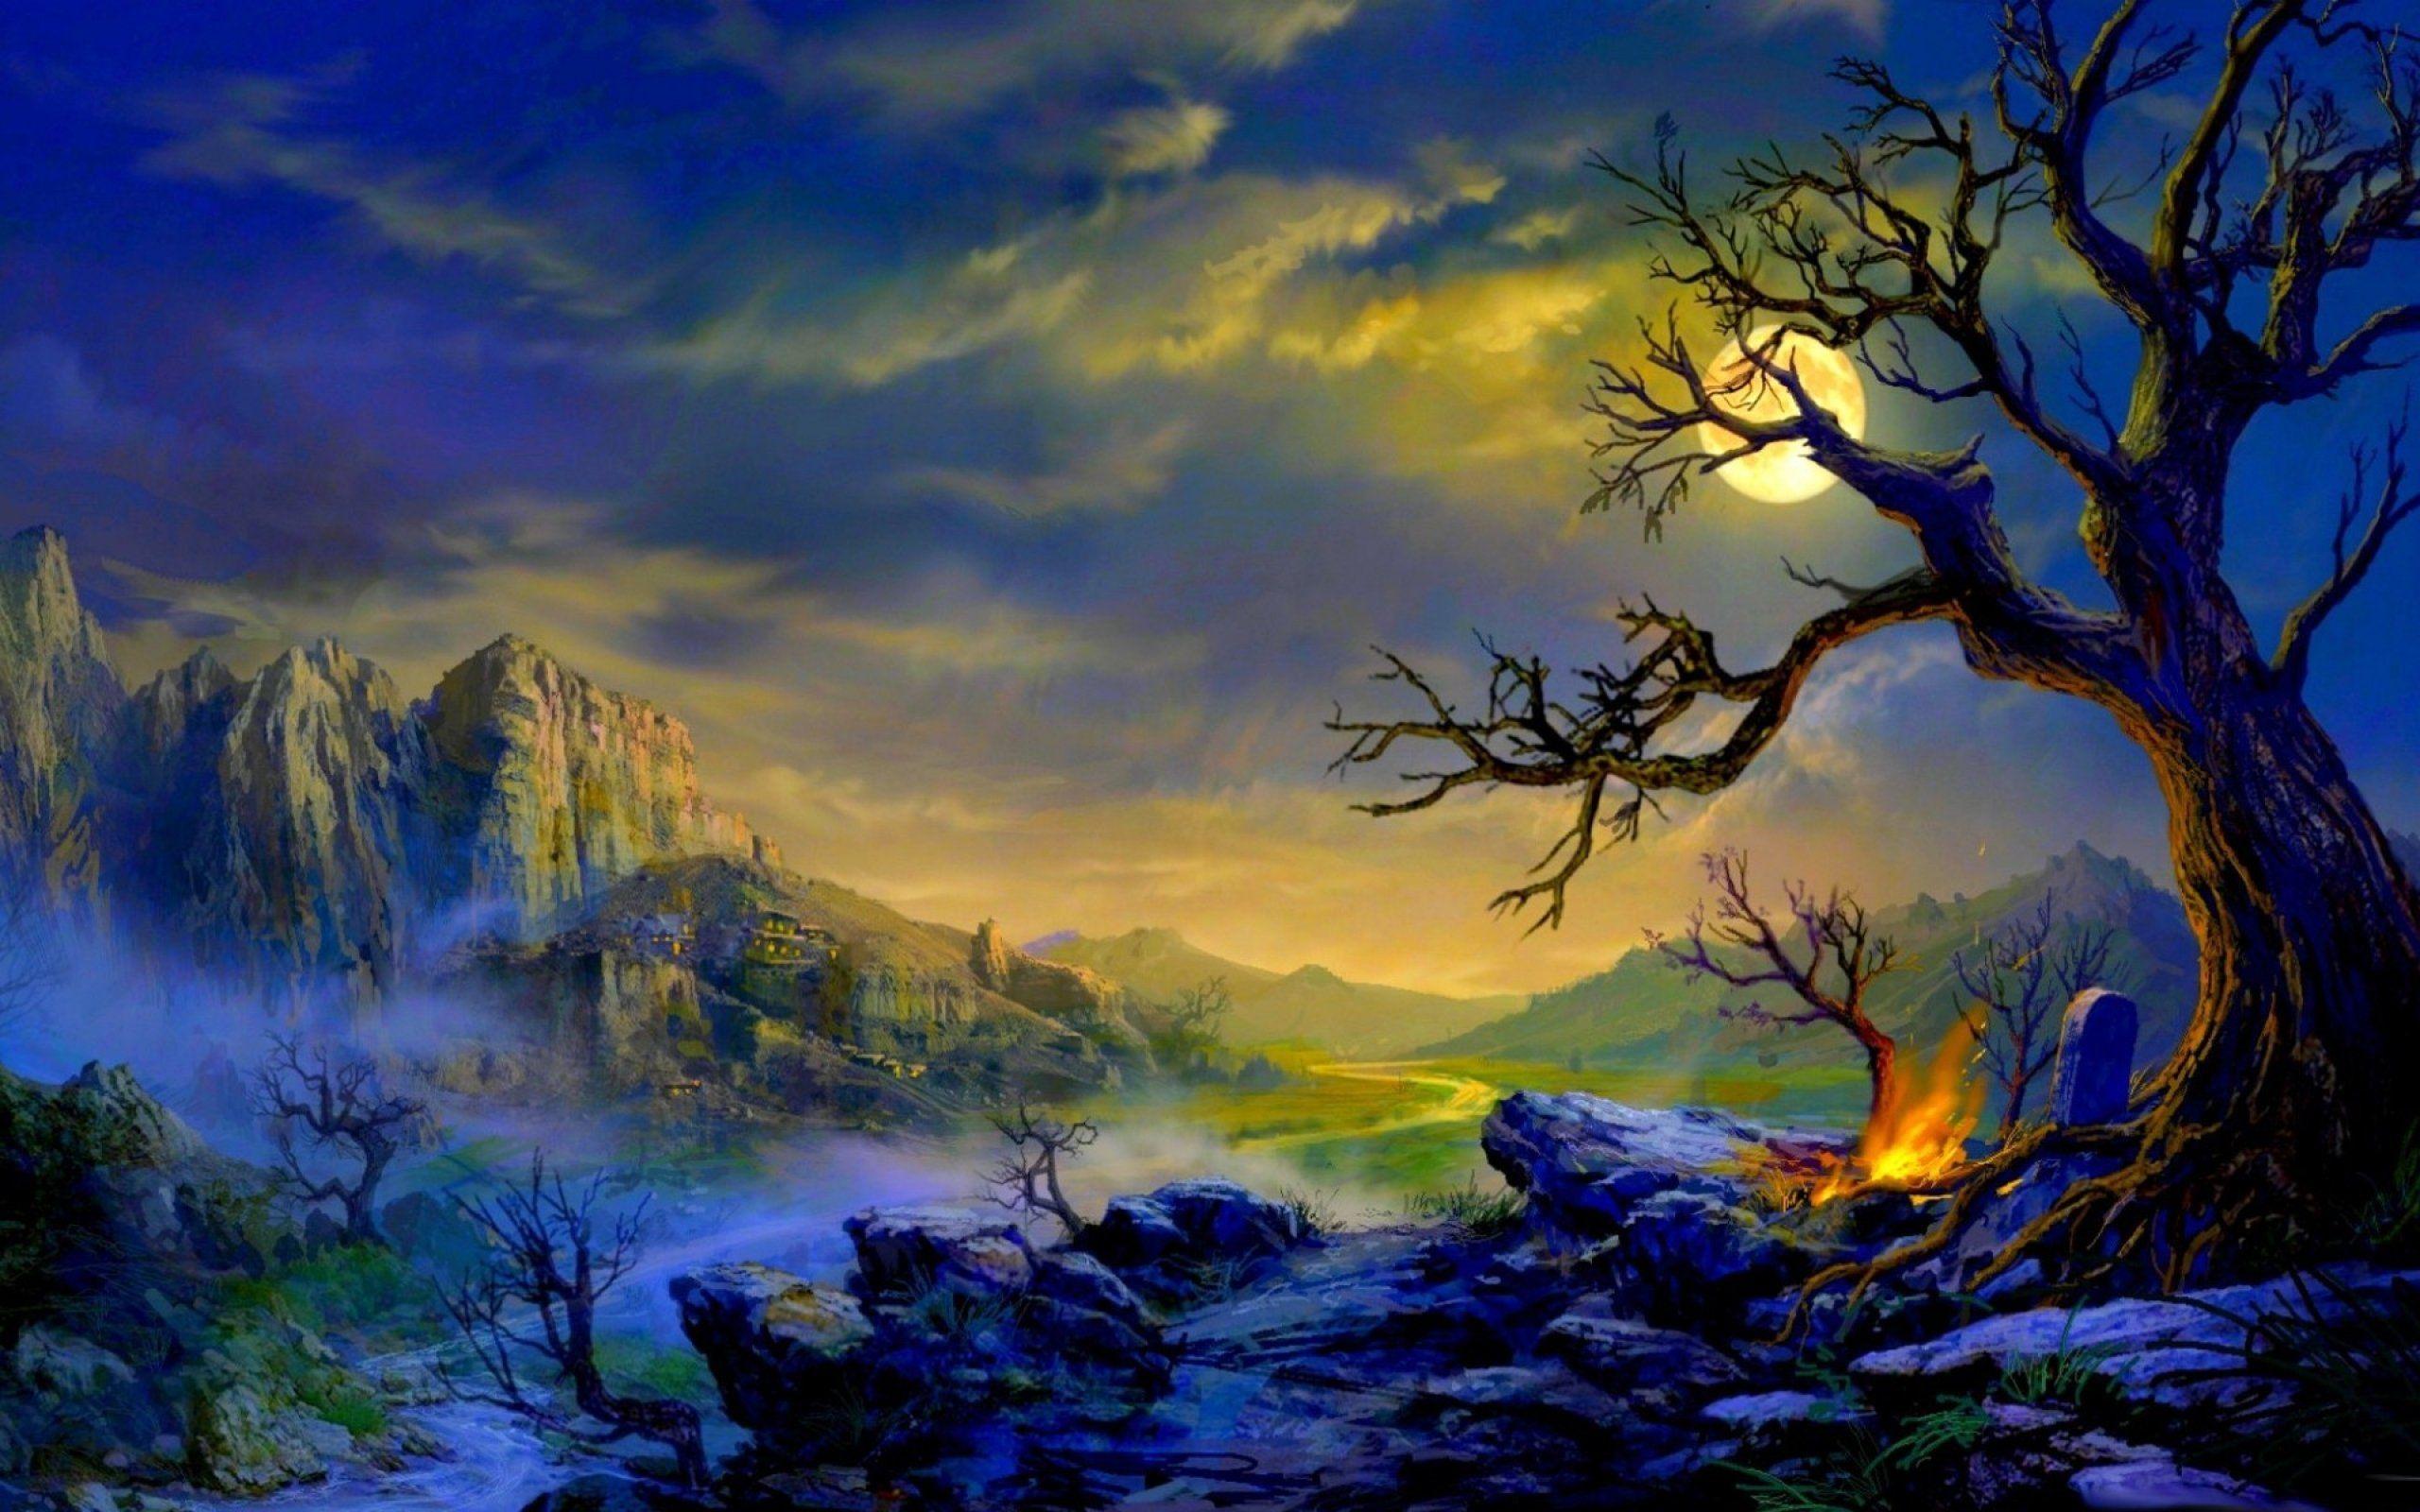 Fantasy Landscape Art Artwork Nature Scenery Wallpaper 2560x1600 Fantasy Landscape Scenery Wallpaper Landscape Art